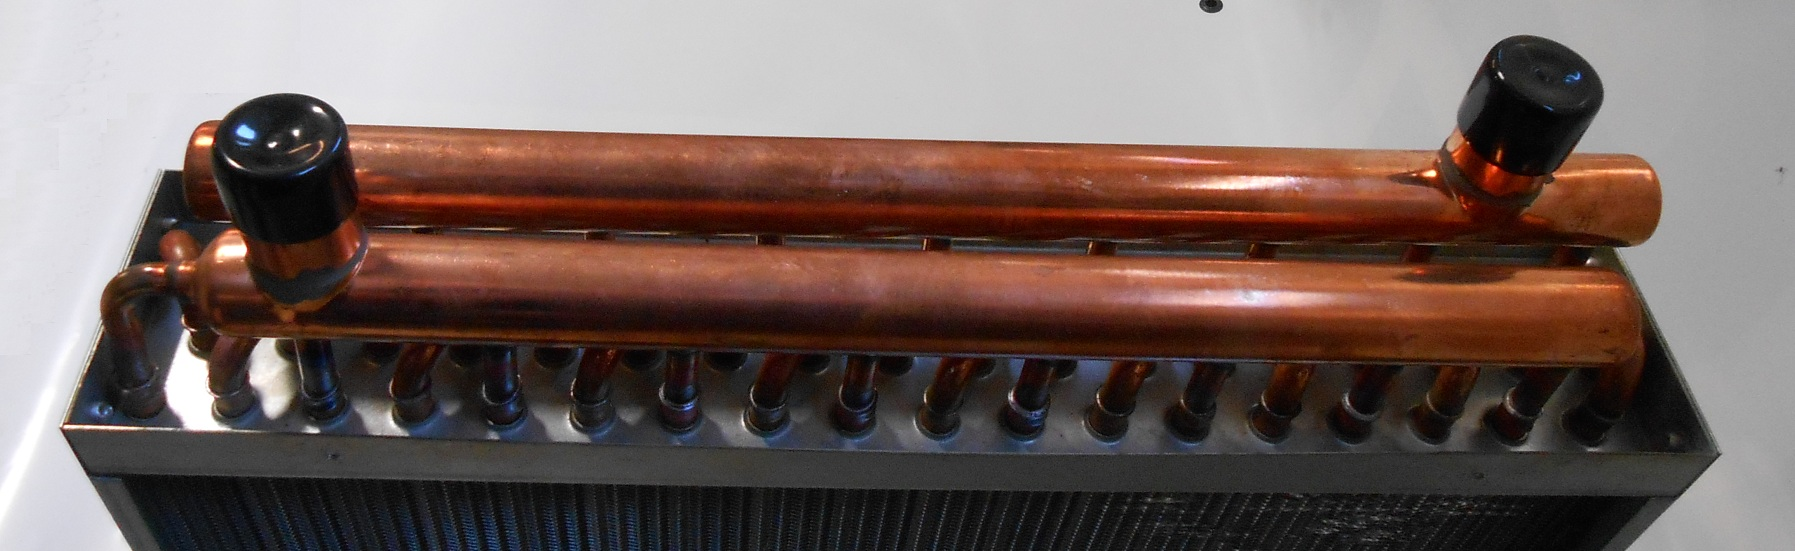 Air Heat Exchanger ~ Water to air heat exchanger hot coil outdoor